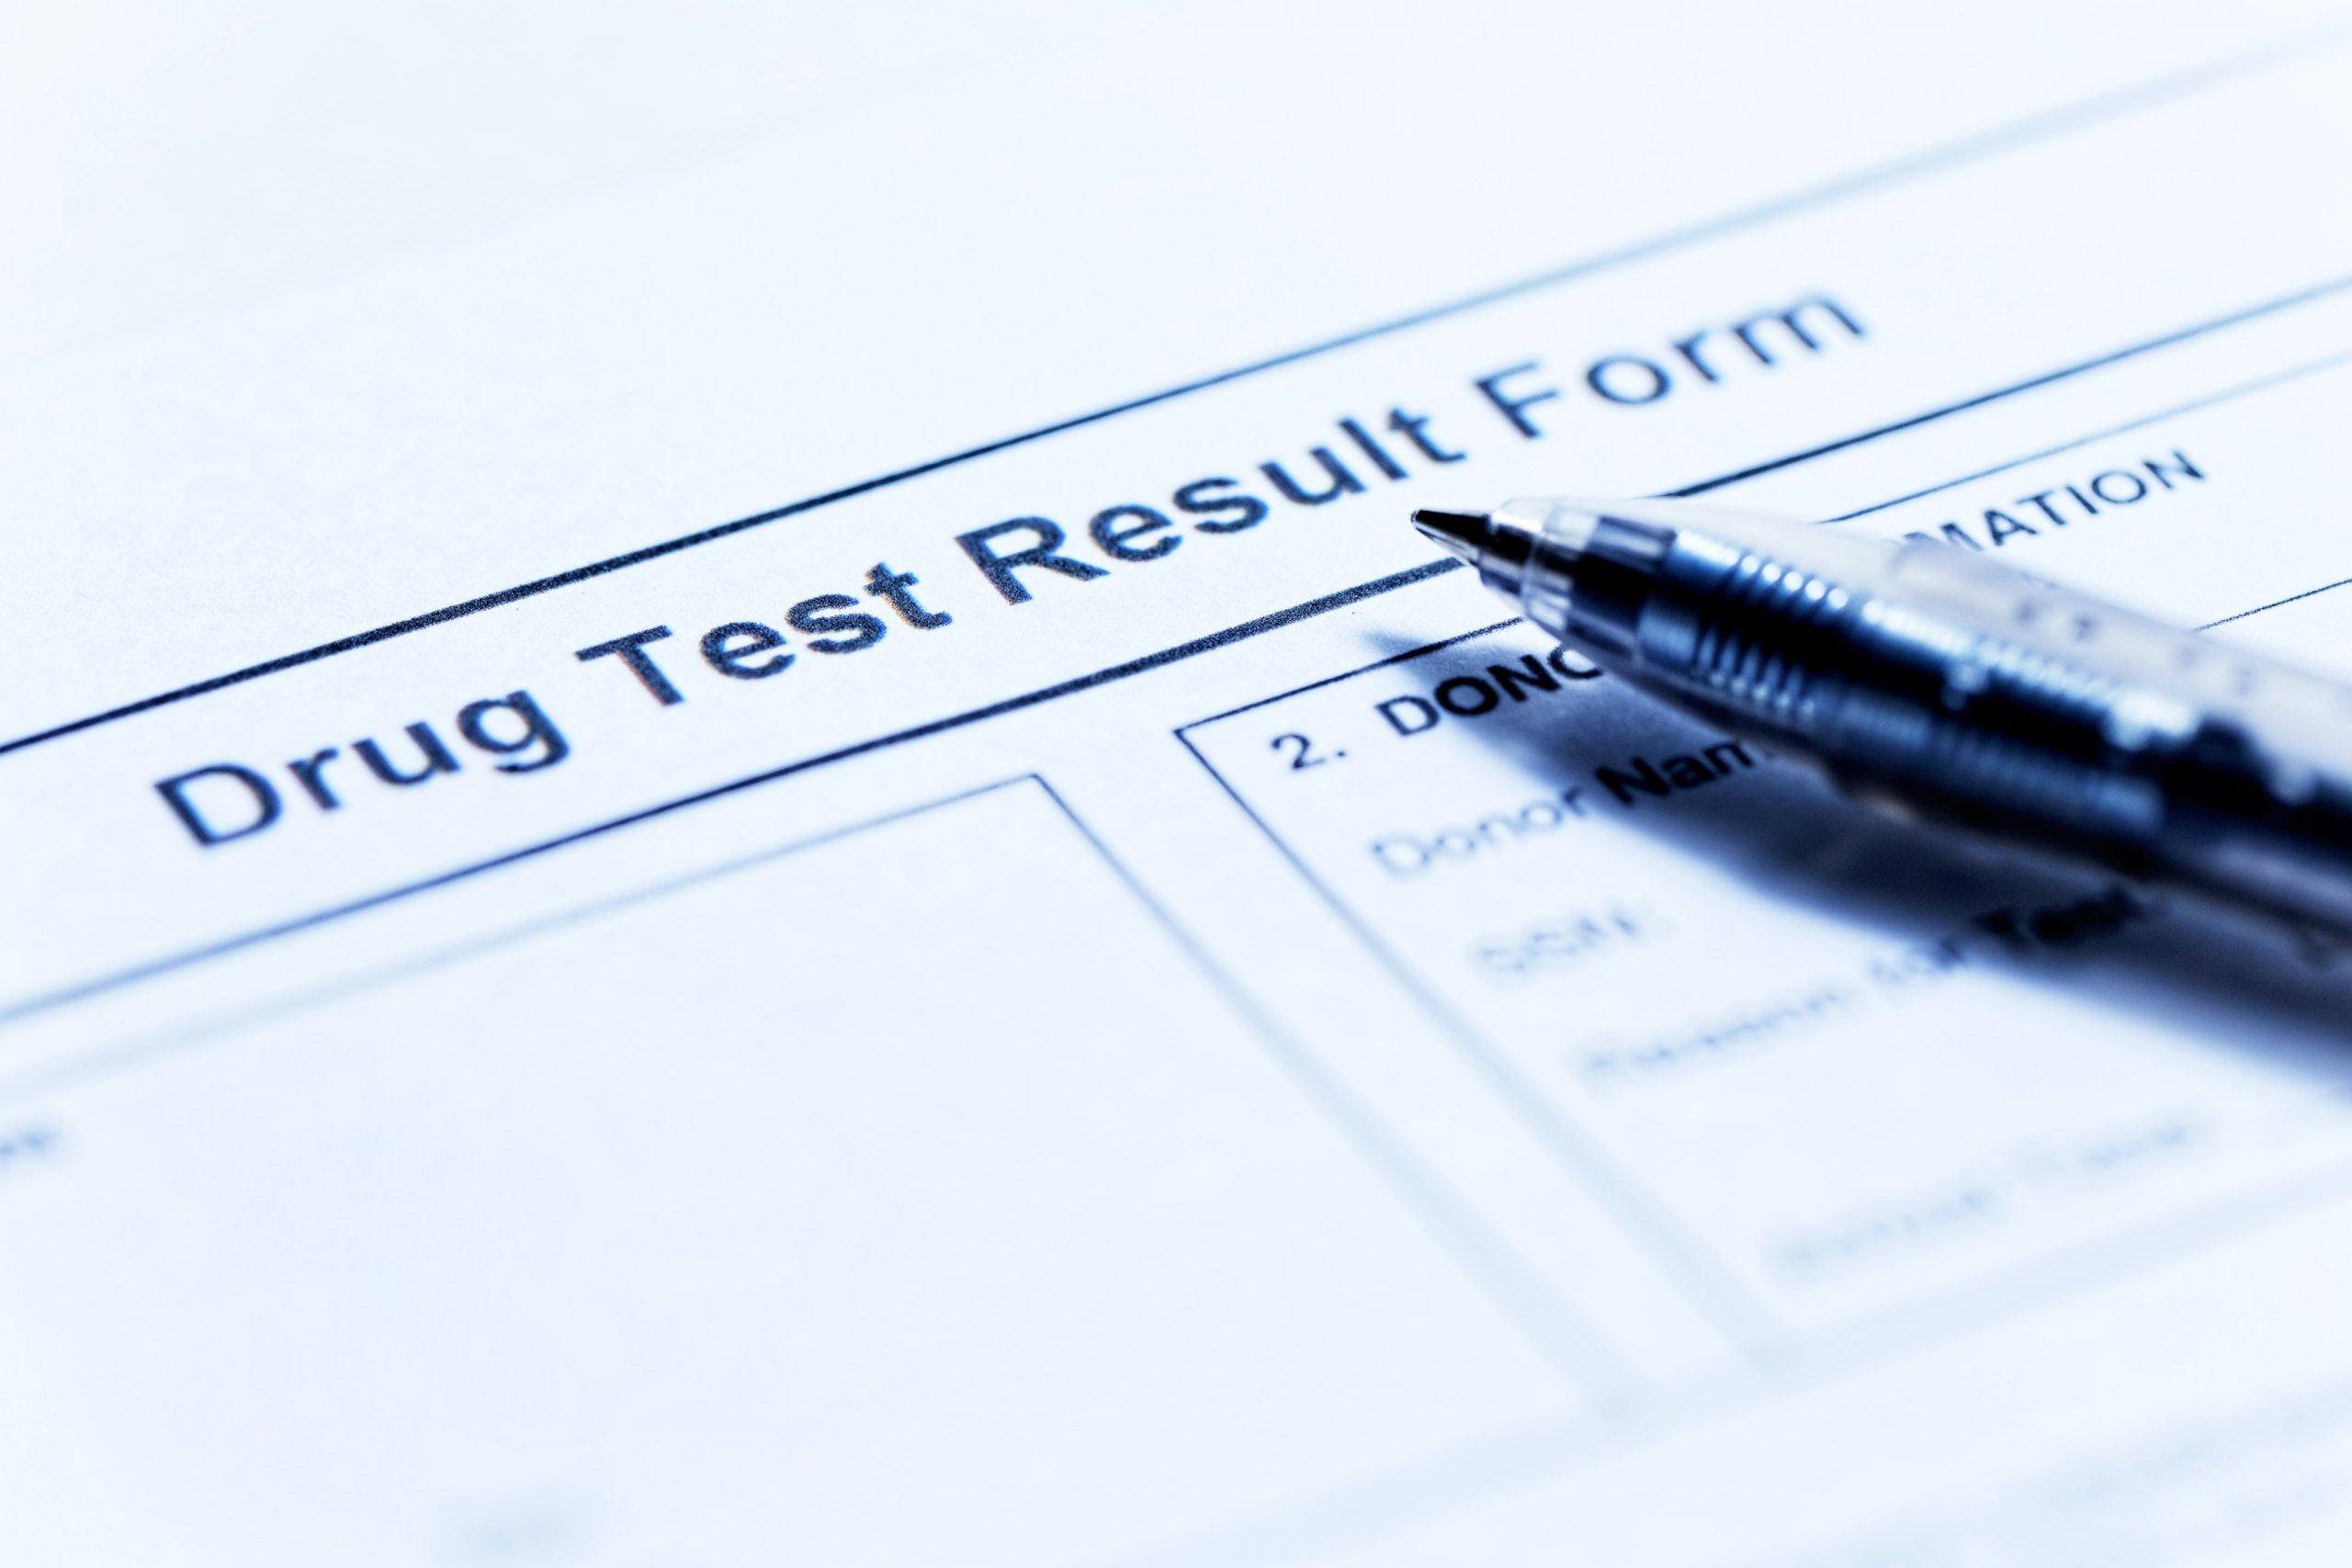 datwa minnesota drug test result form